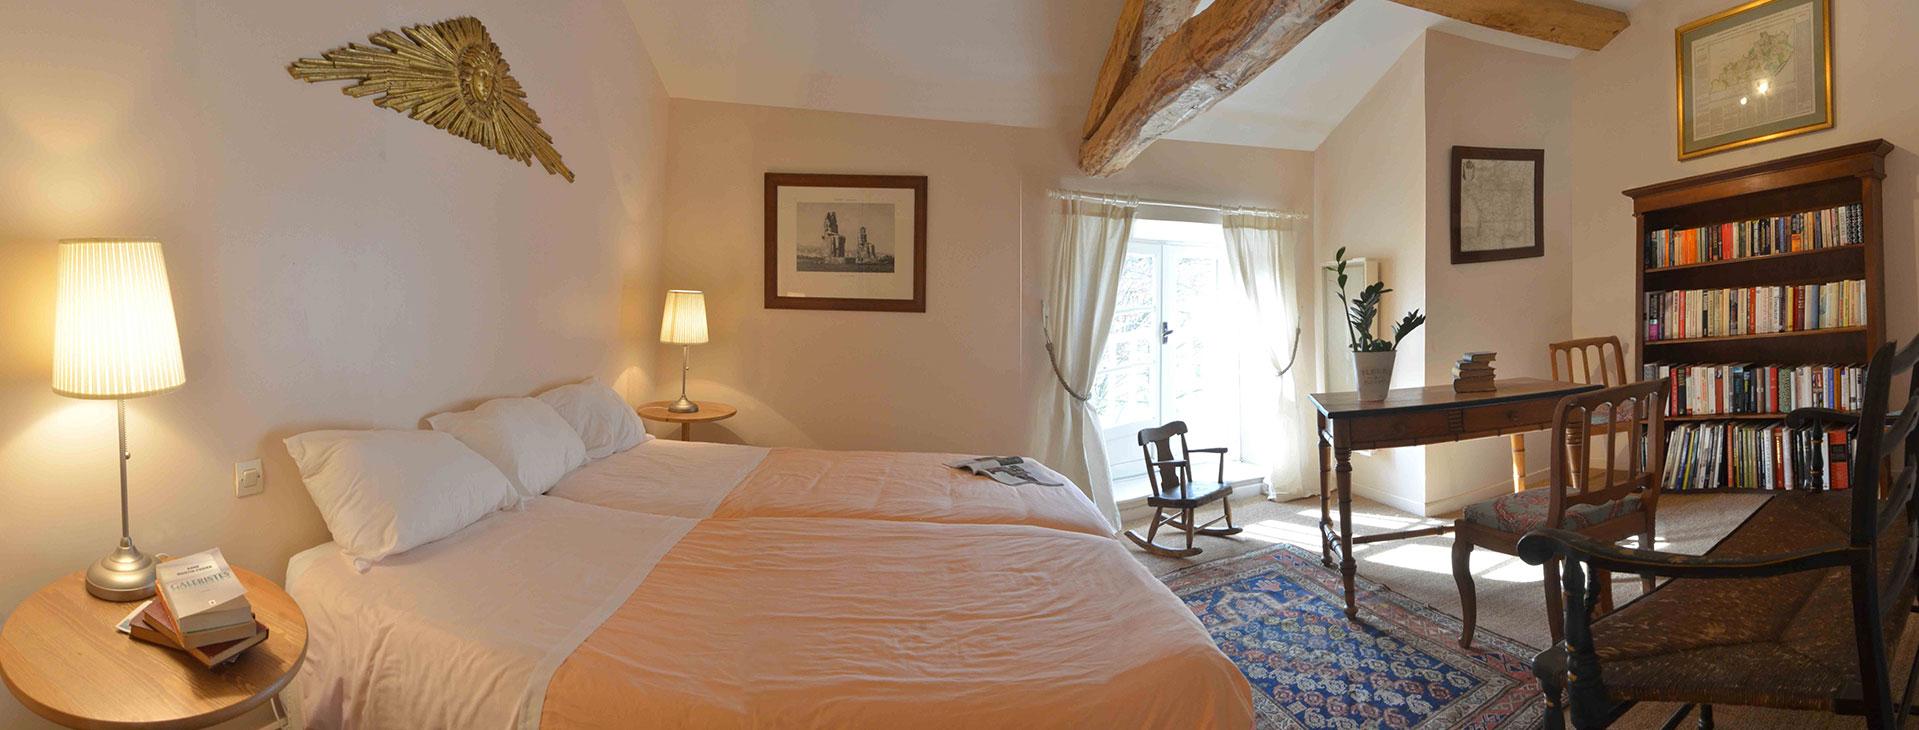 Chambre Soleil / Sun Bedroom